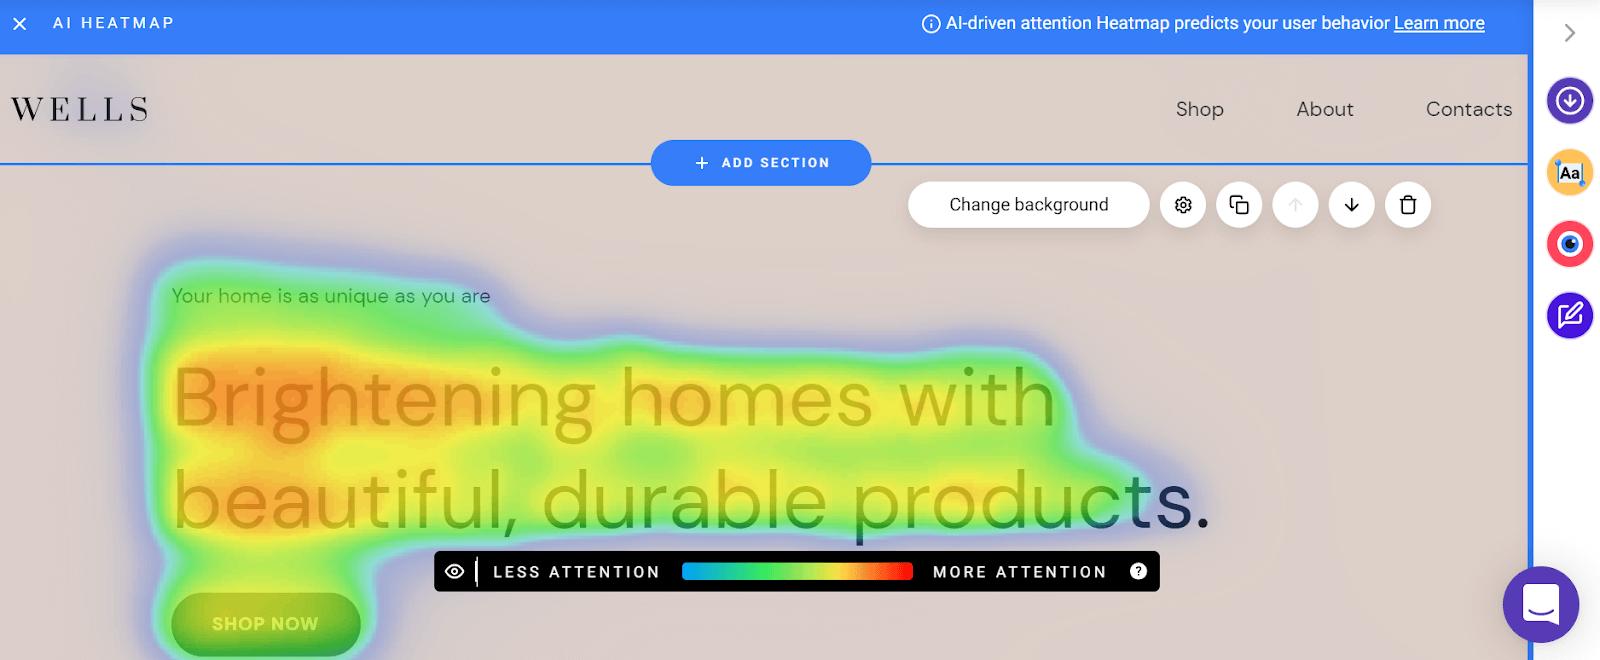 AI Heatmap